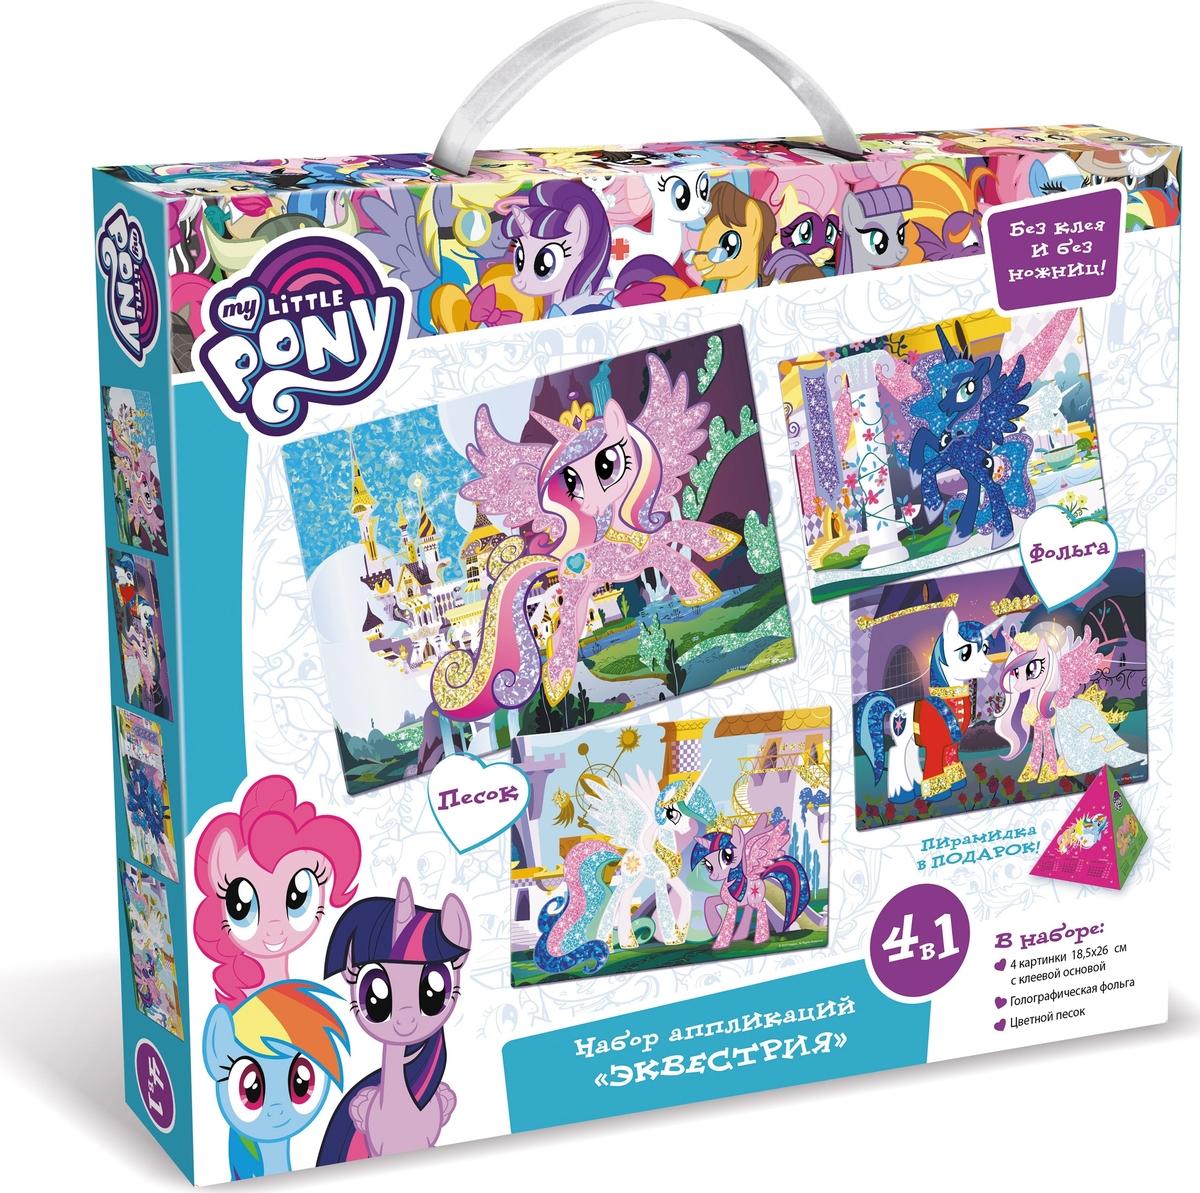 My Little Pony Набор аппликаций 4в1 Эквестрия 4 картинки my little pony origami набор аппликаций origami my little pony эквестрия 4в1